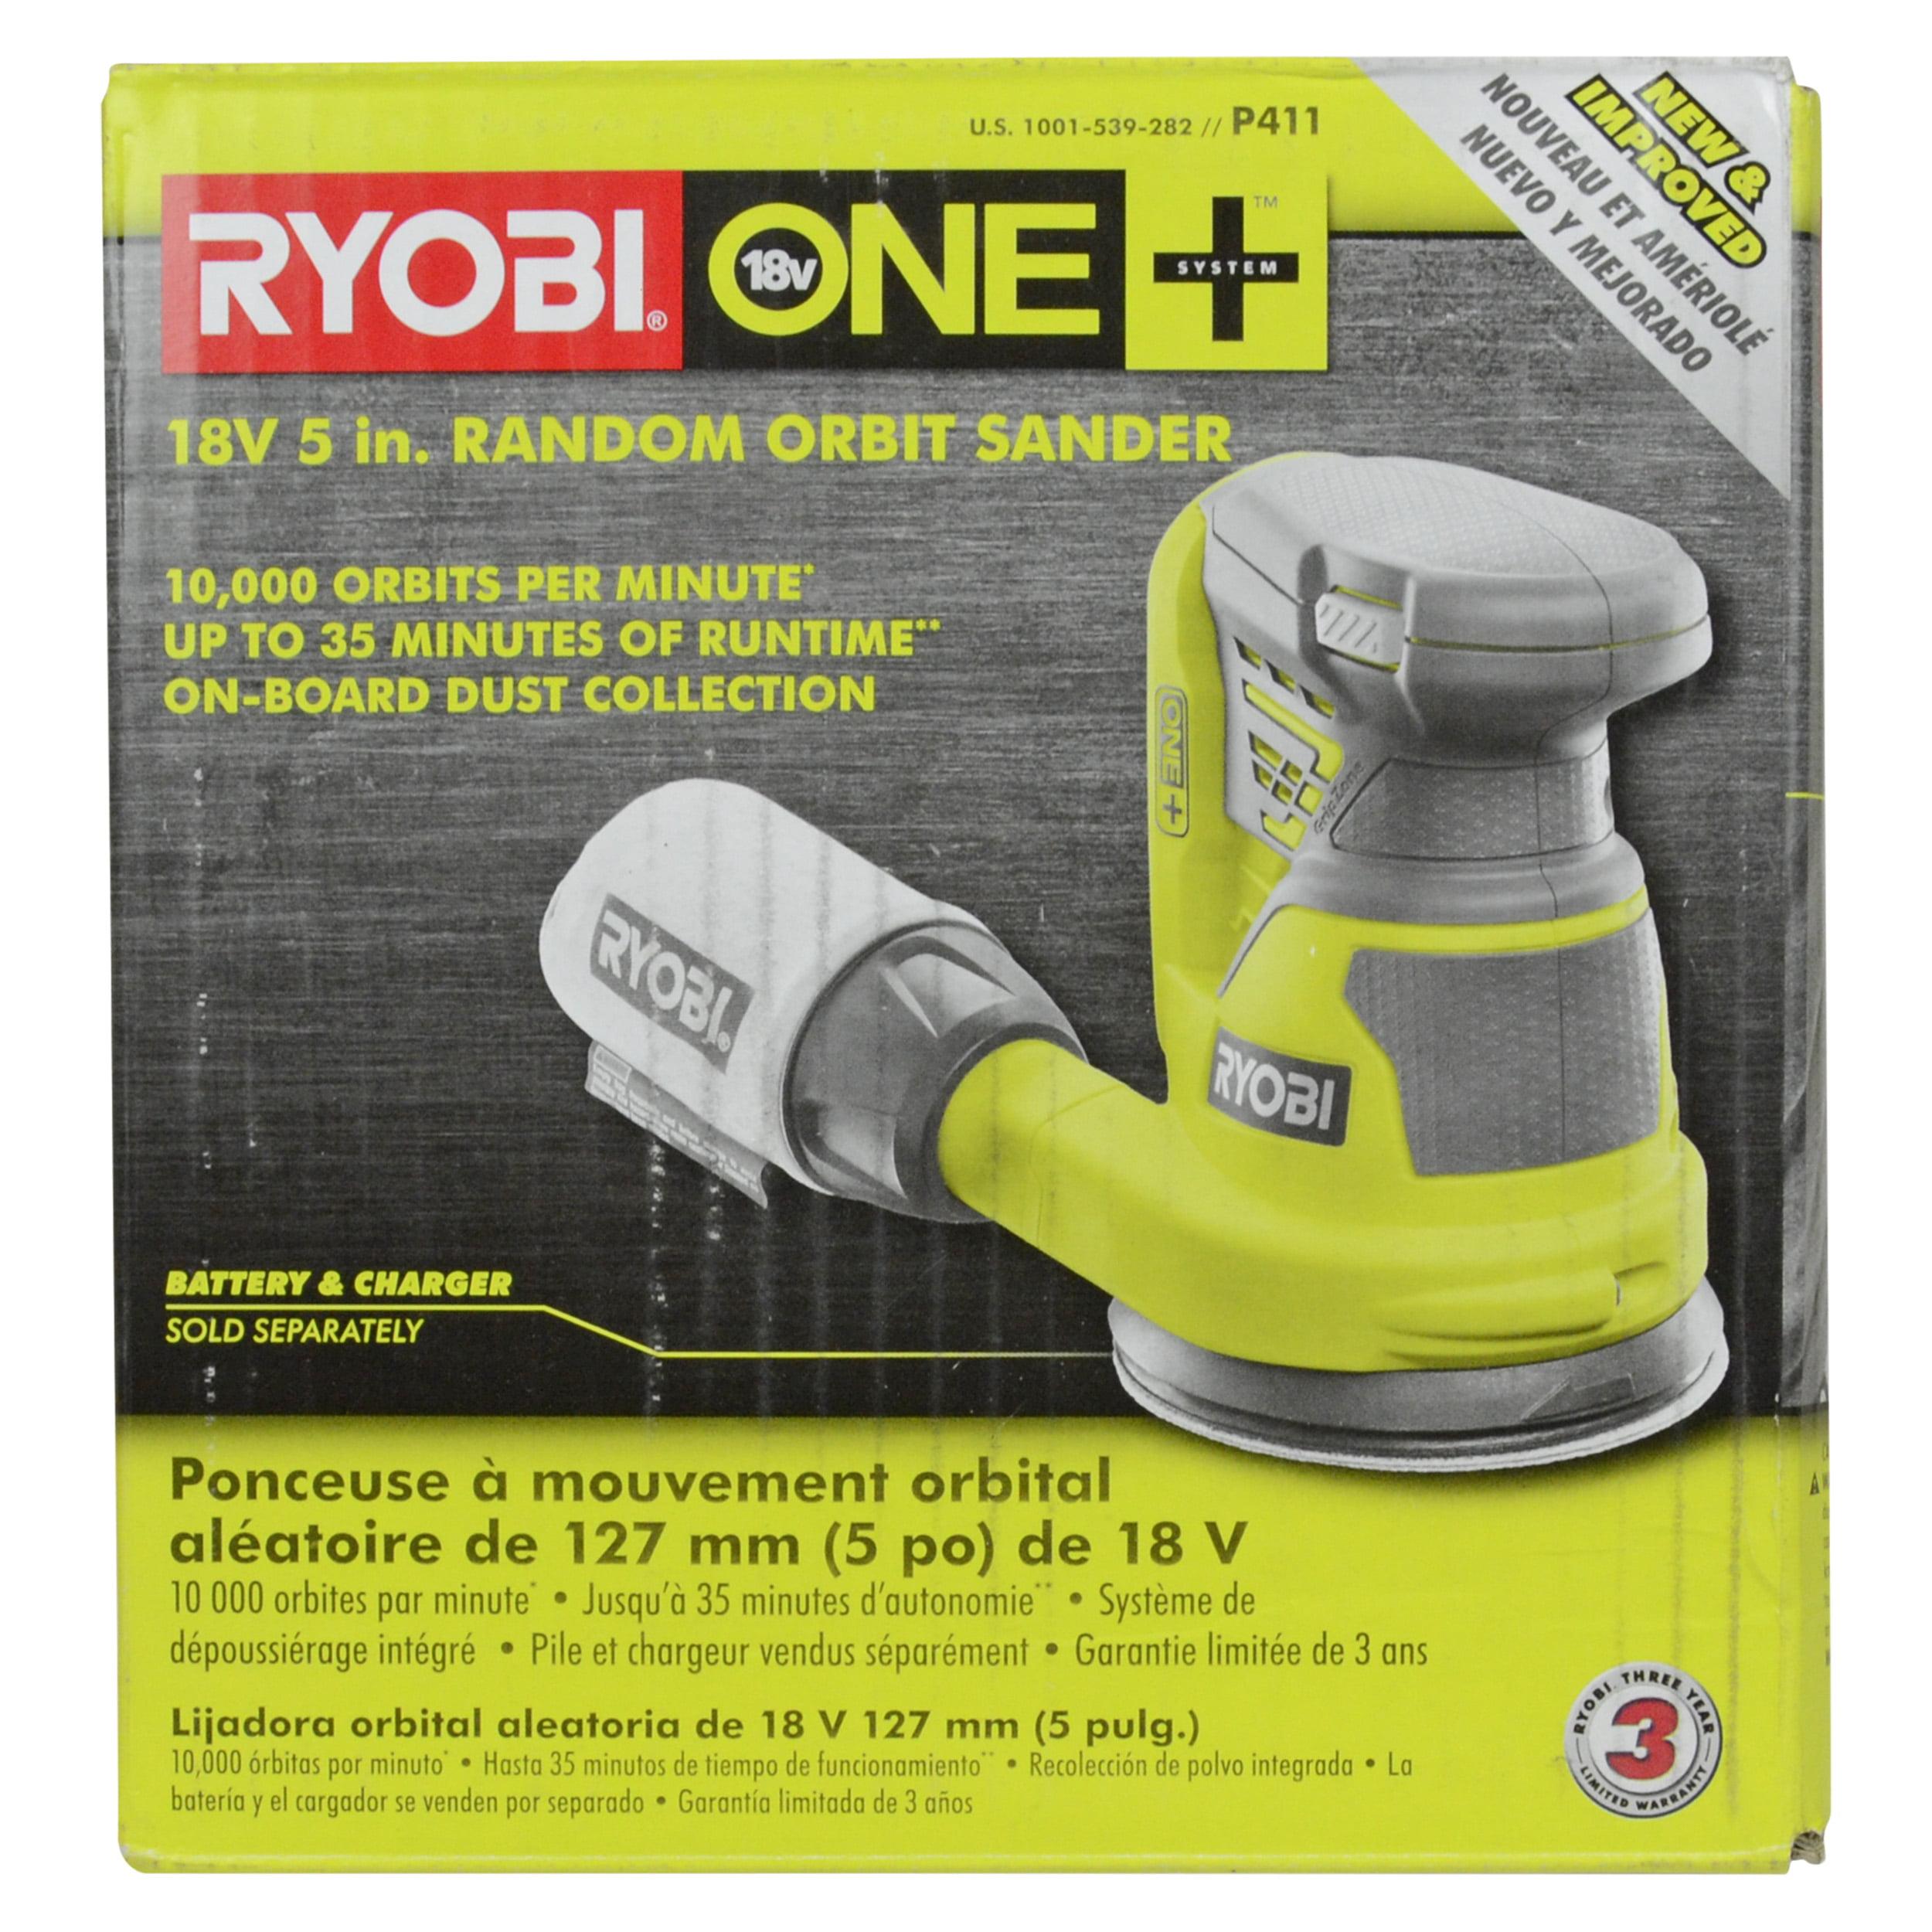 Ryobi Tools P411 18V ONE+ Lithium Ion 5� Random Orbit Sander, TOOL ONLY by